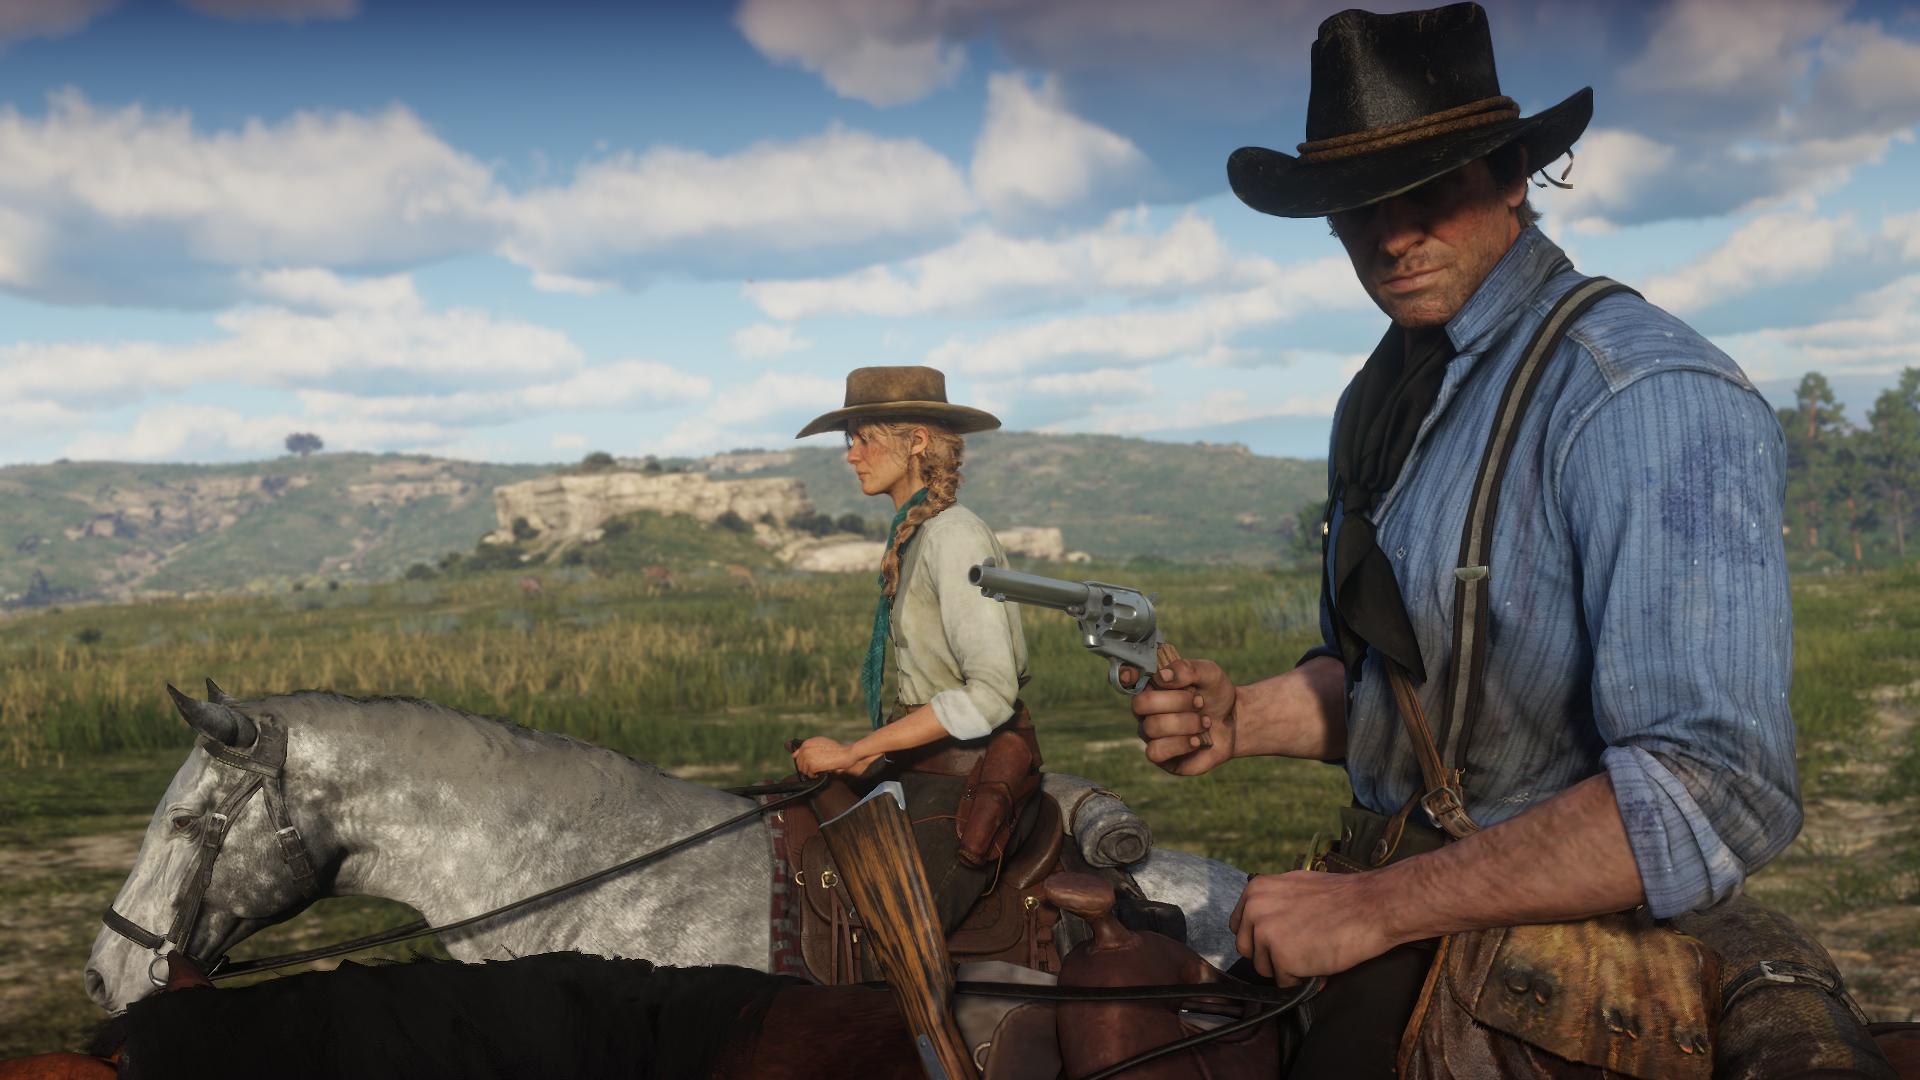 Big Red Dead Redemption 2 leak reveals single-player details, Battle